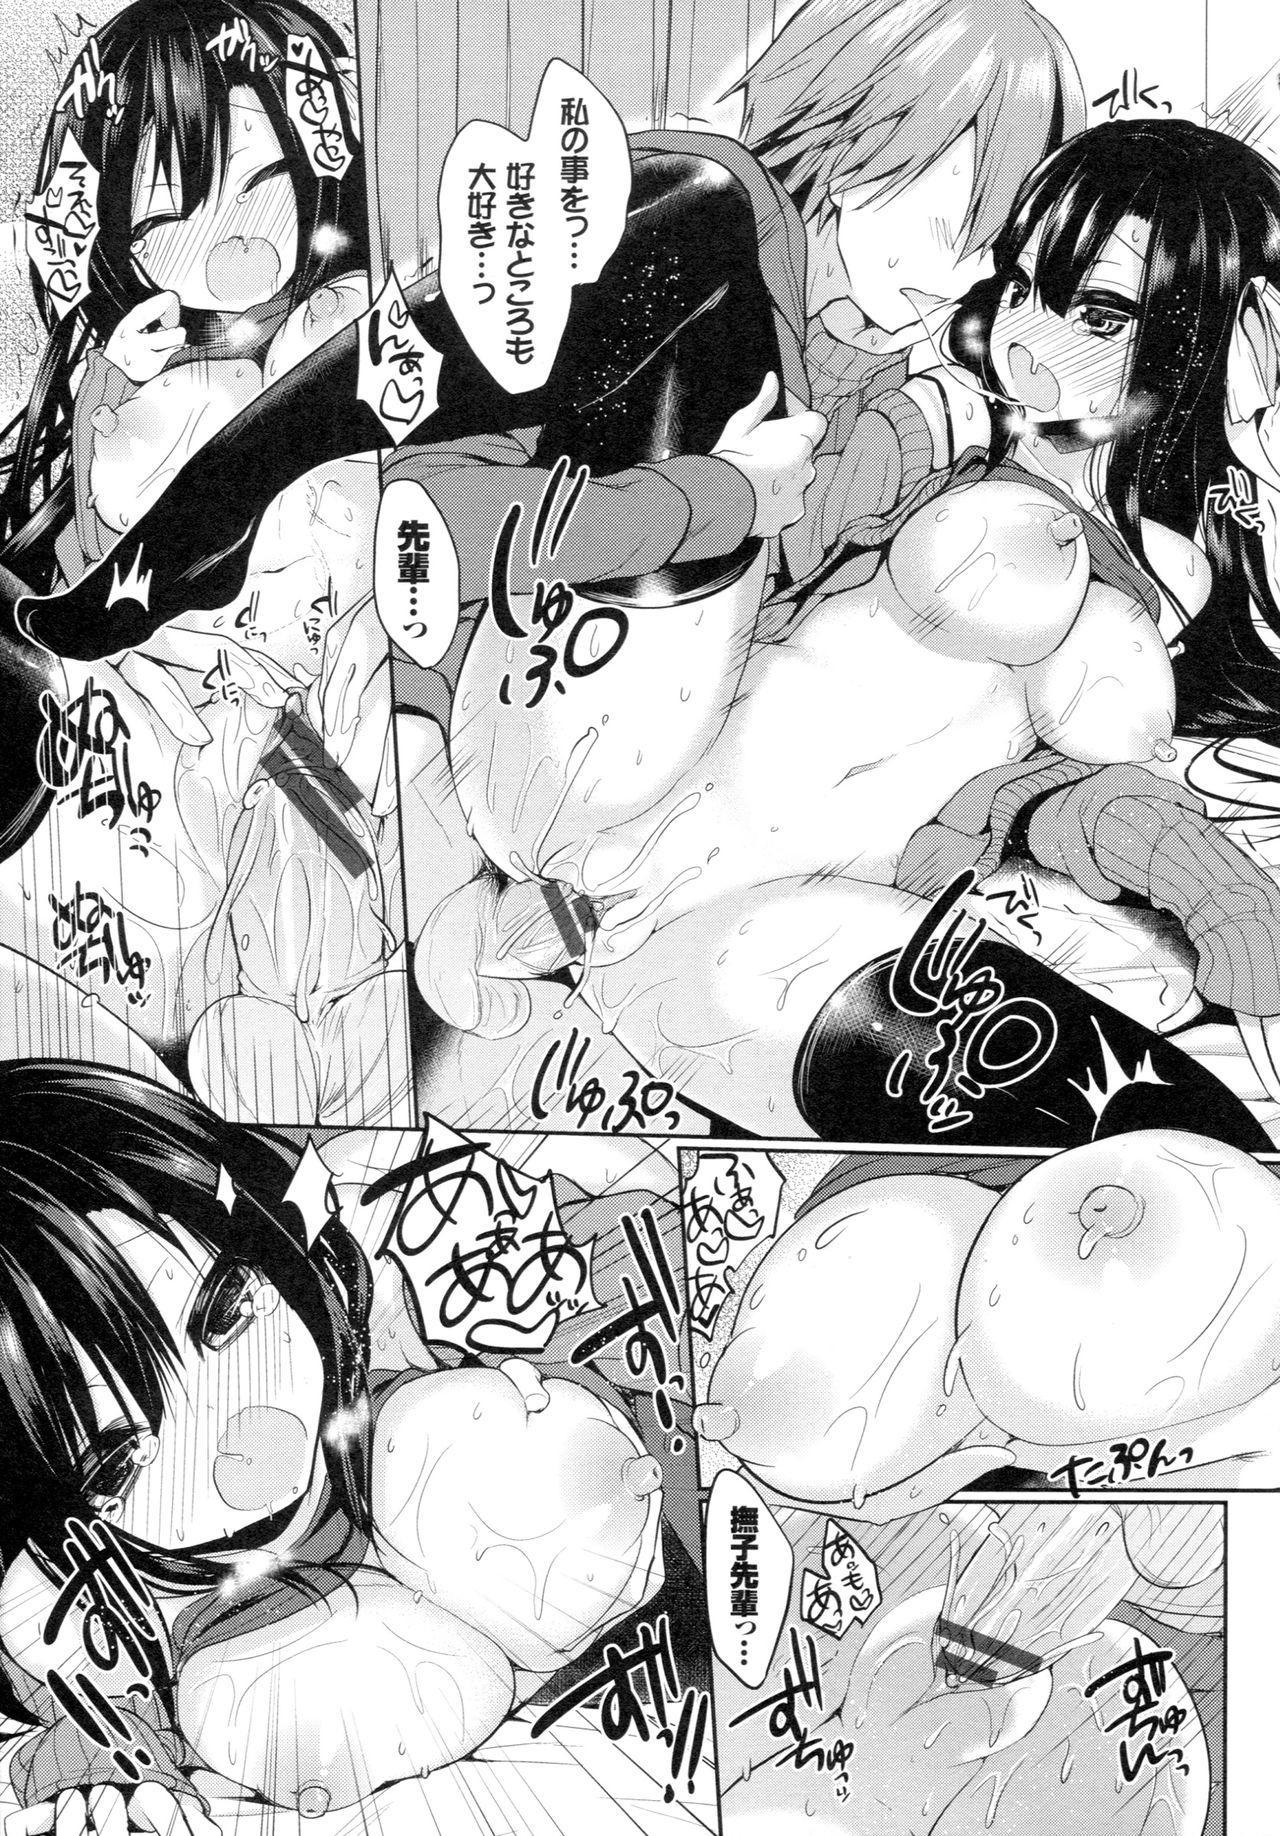 [Ayuma Sayu] Junai Maniac ~RePure~ B2 Tapestry Tsuki Melon Books Genteiban 122